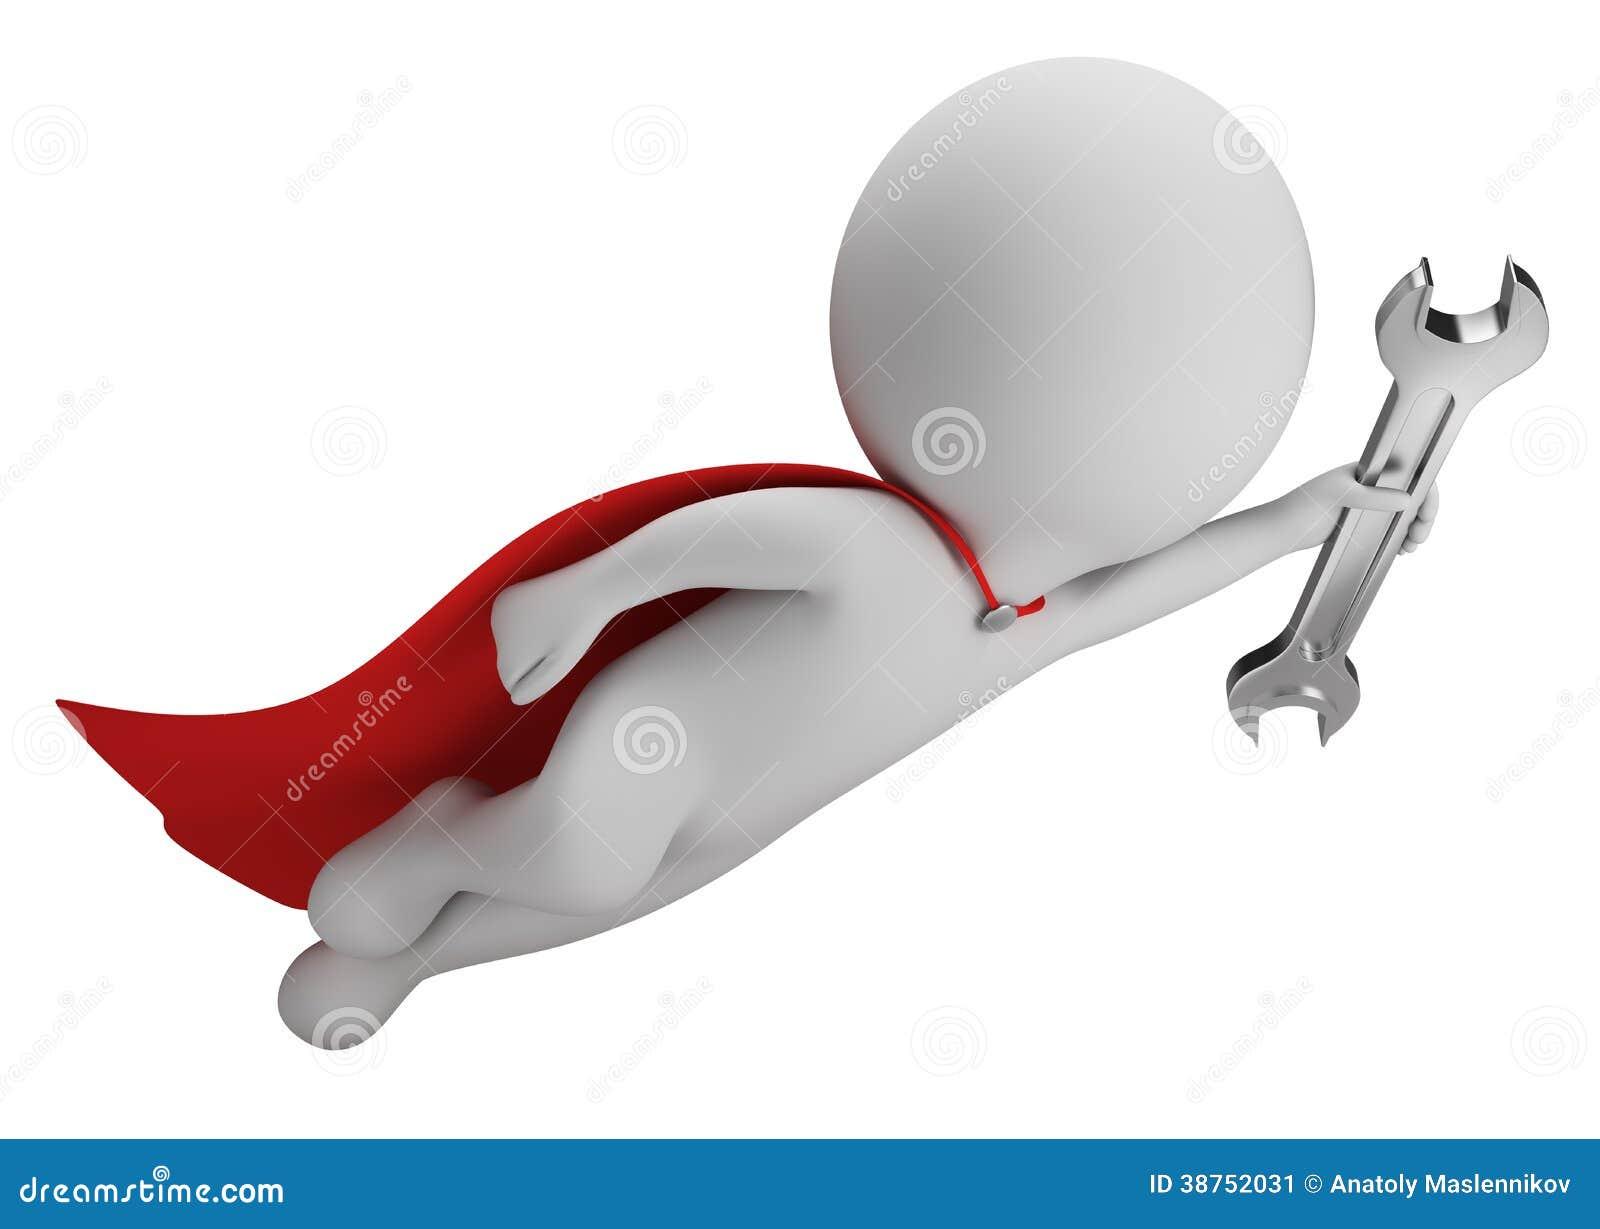 Small Motor Repair >> 3d Small People - Super Mechanic Stock Illustration - Image: 38752031